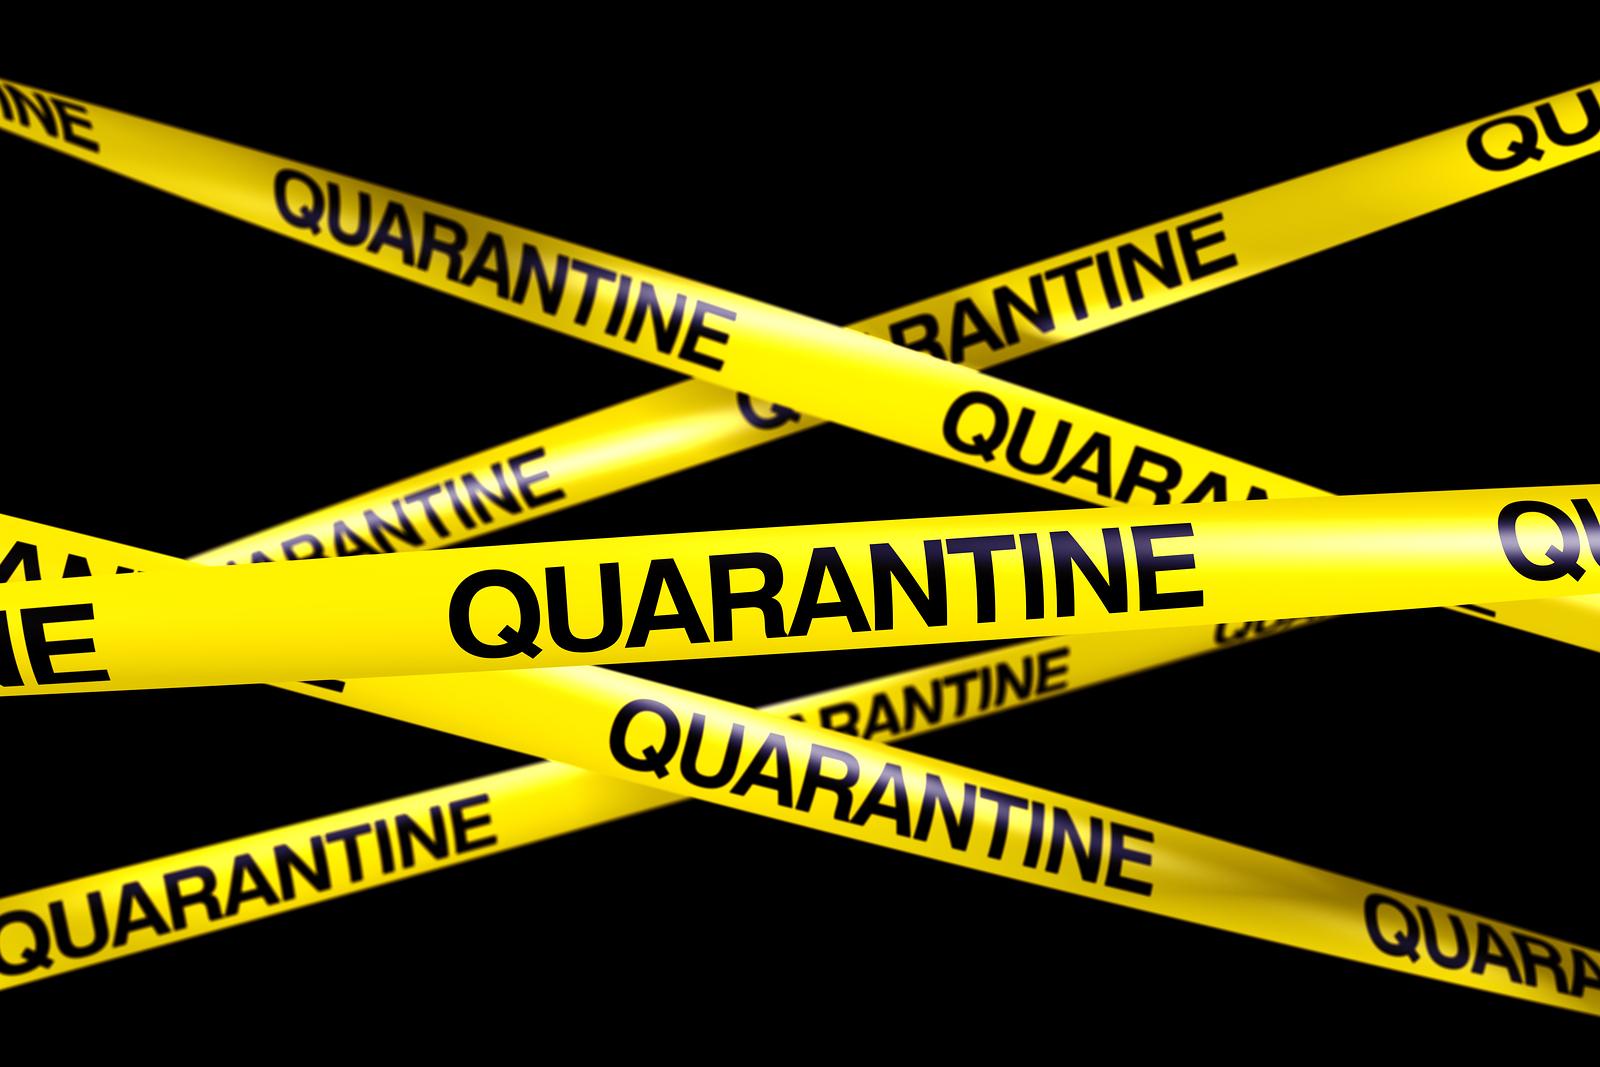 Preparing for Quarantine - The Prepared Page